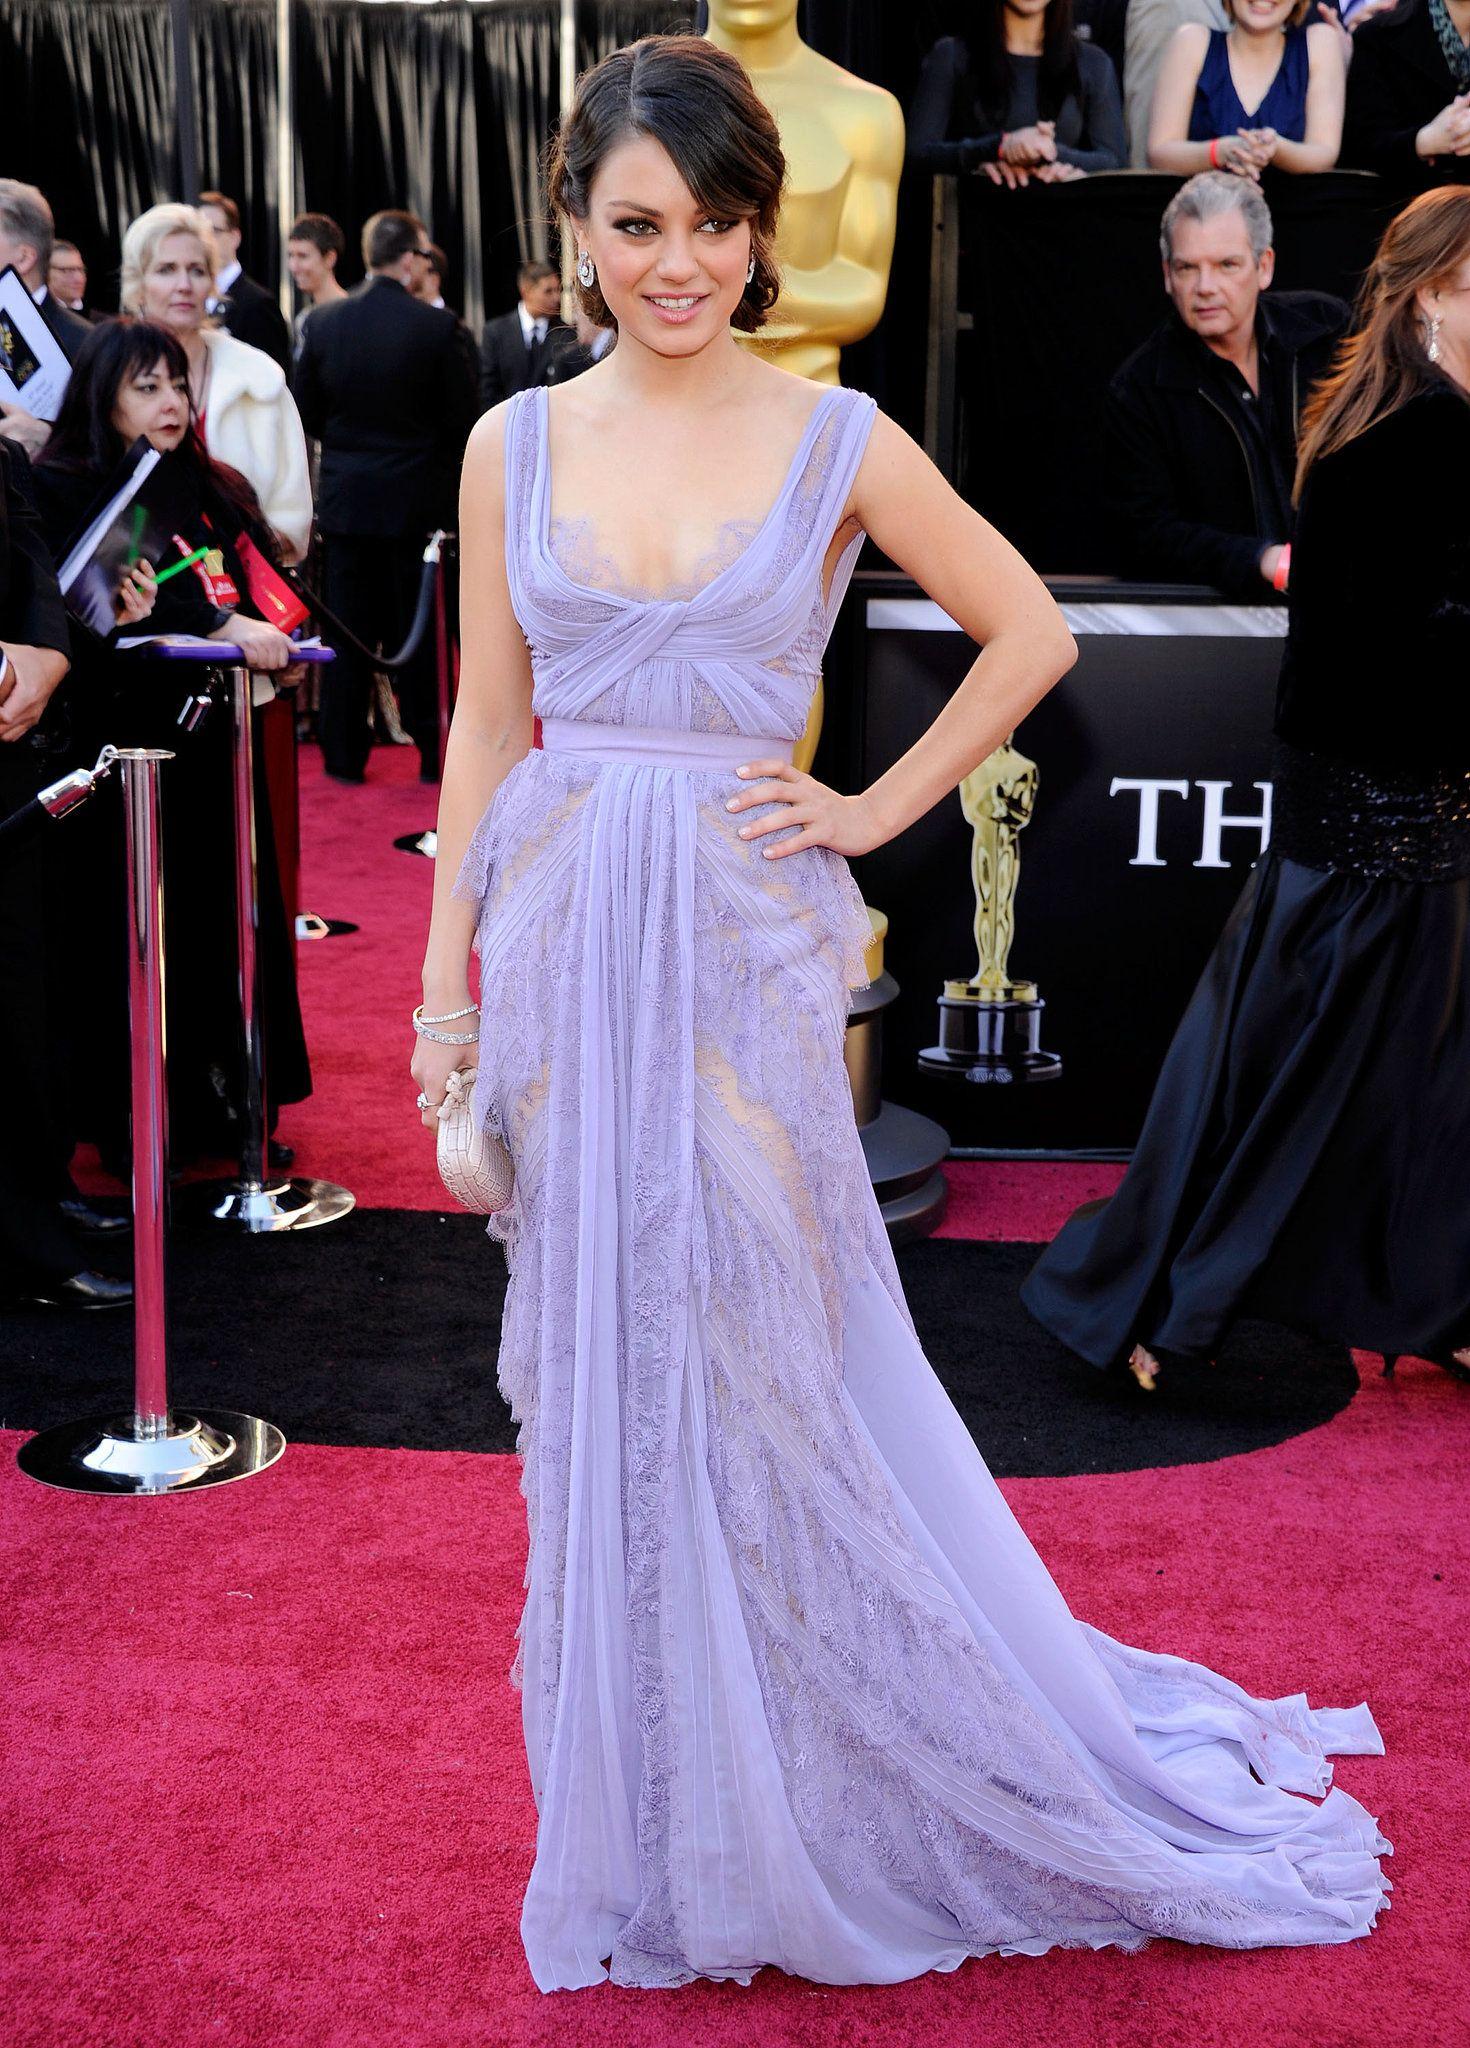 Mila kunis wedding dress  Mila Kunis Style Profile  Pinterest  Elie saab couture Mila kunis